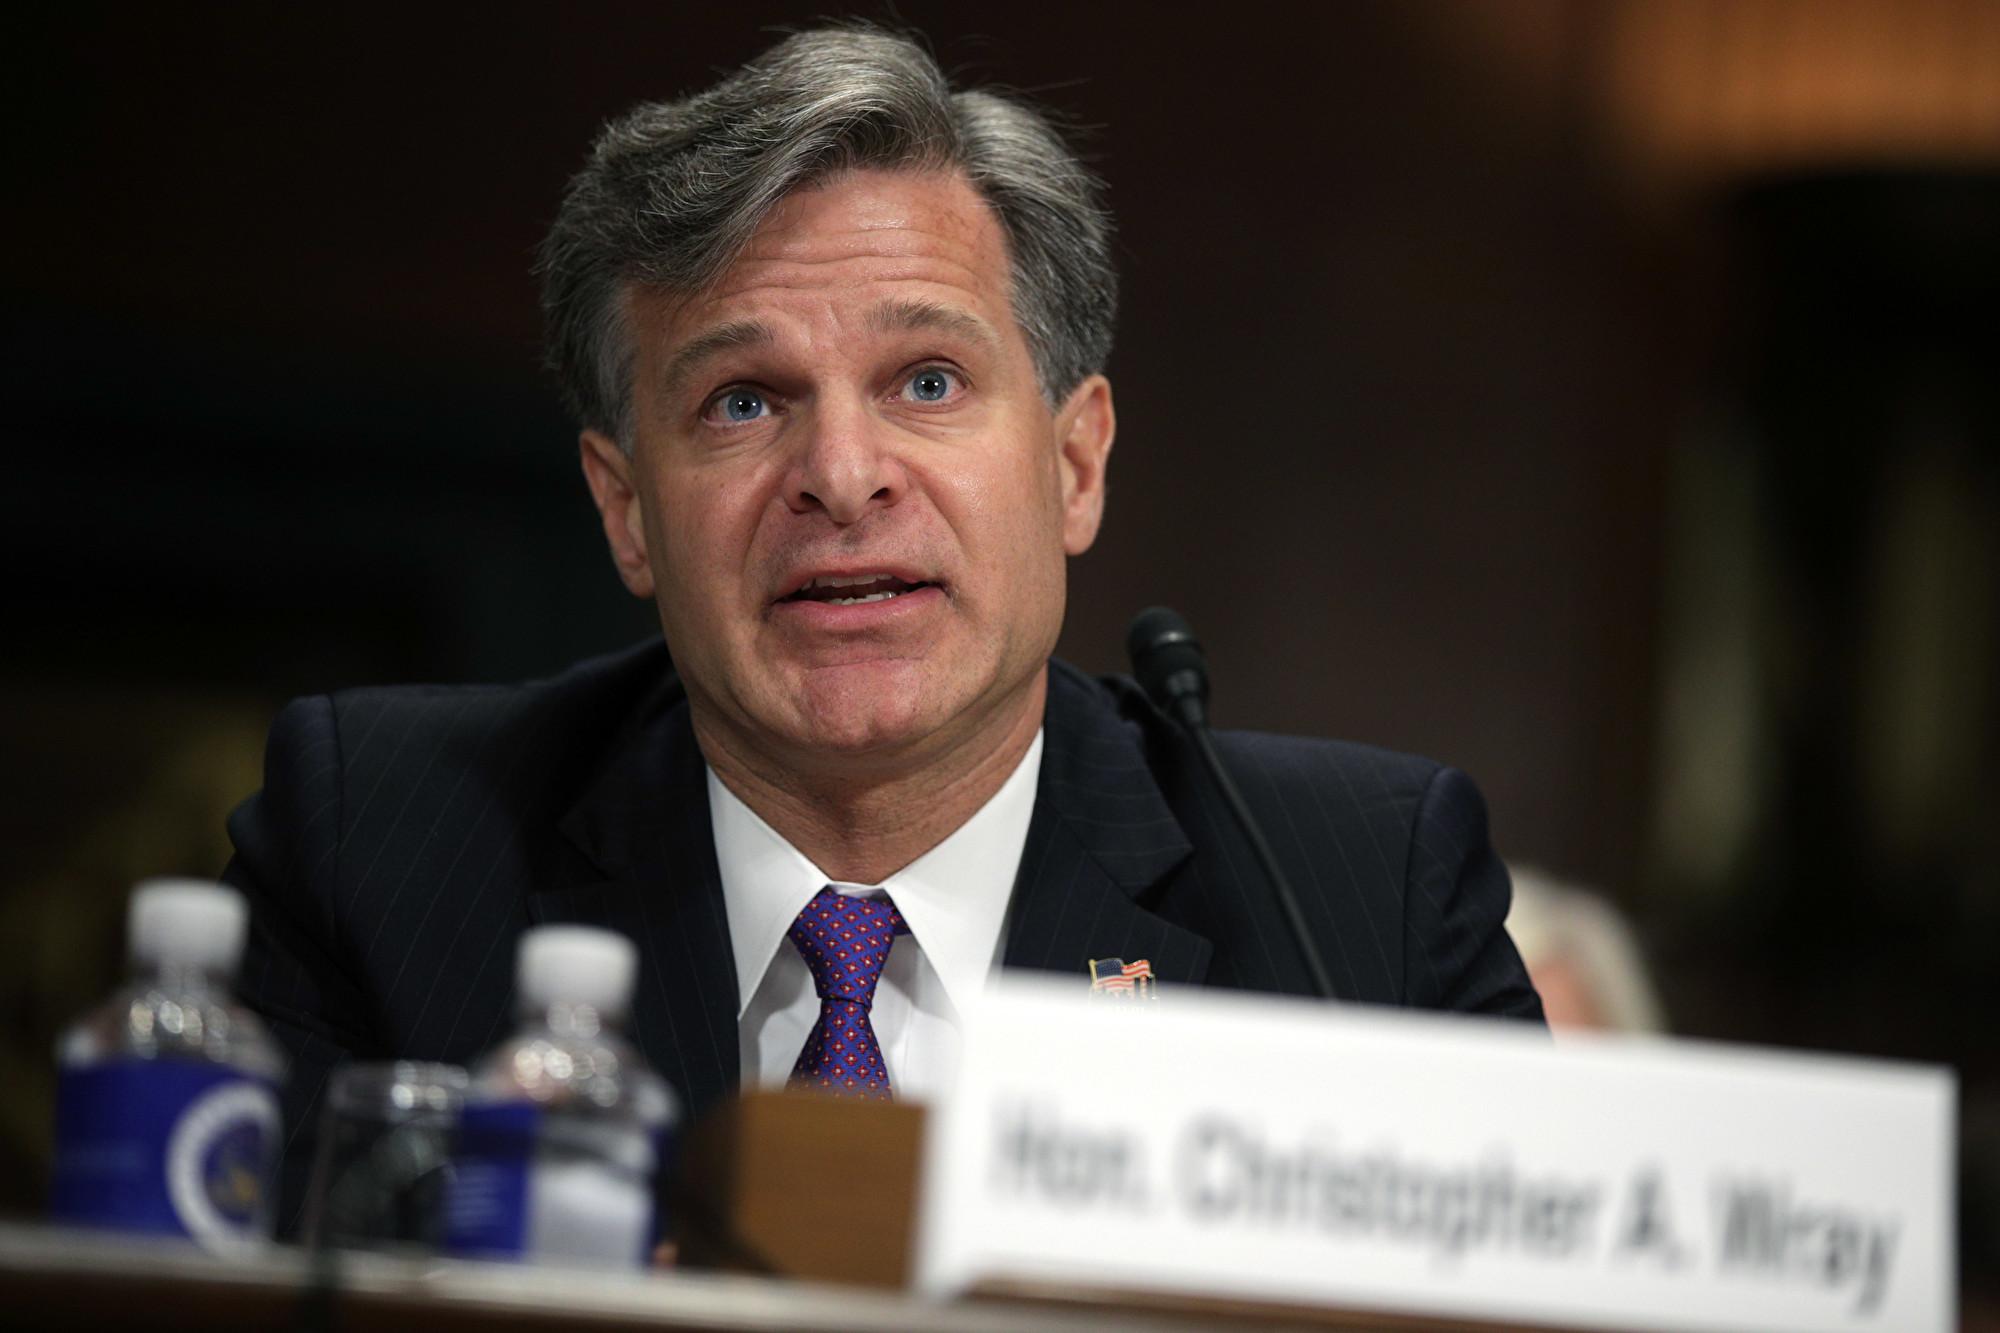 FBI局長:Antifa真實存在 正調查其暴力行為